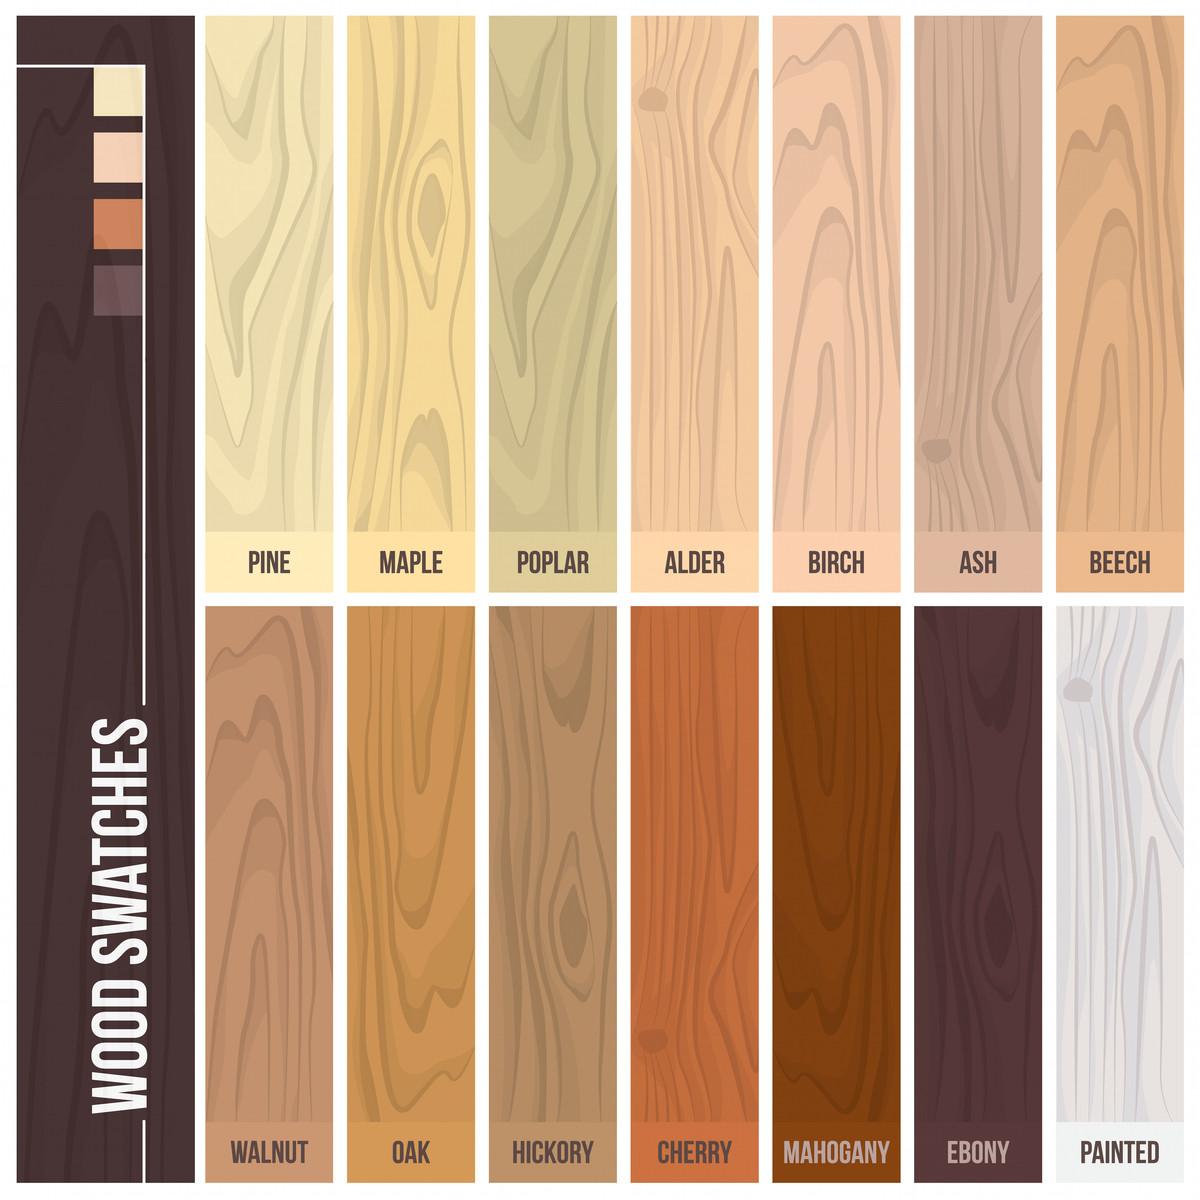 bruce engineered hardwood flooring lowes of 12 types of hardwood flooring species styles edging dimensions pertaining to types of hardwood flooring illustrated guide